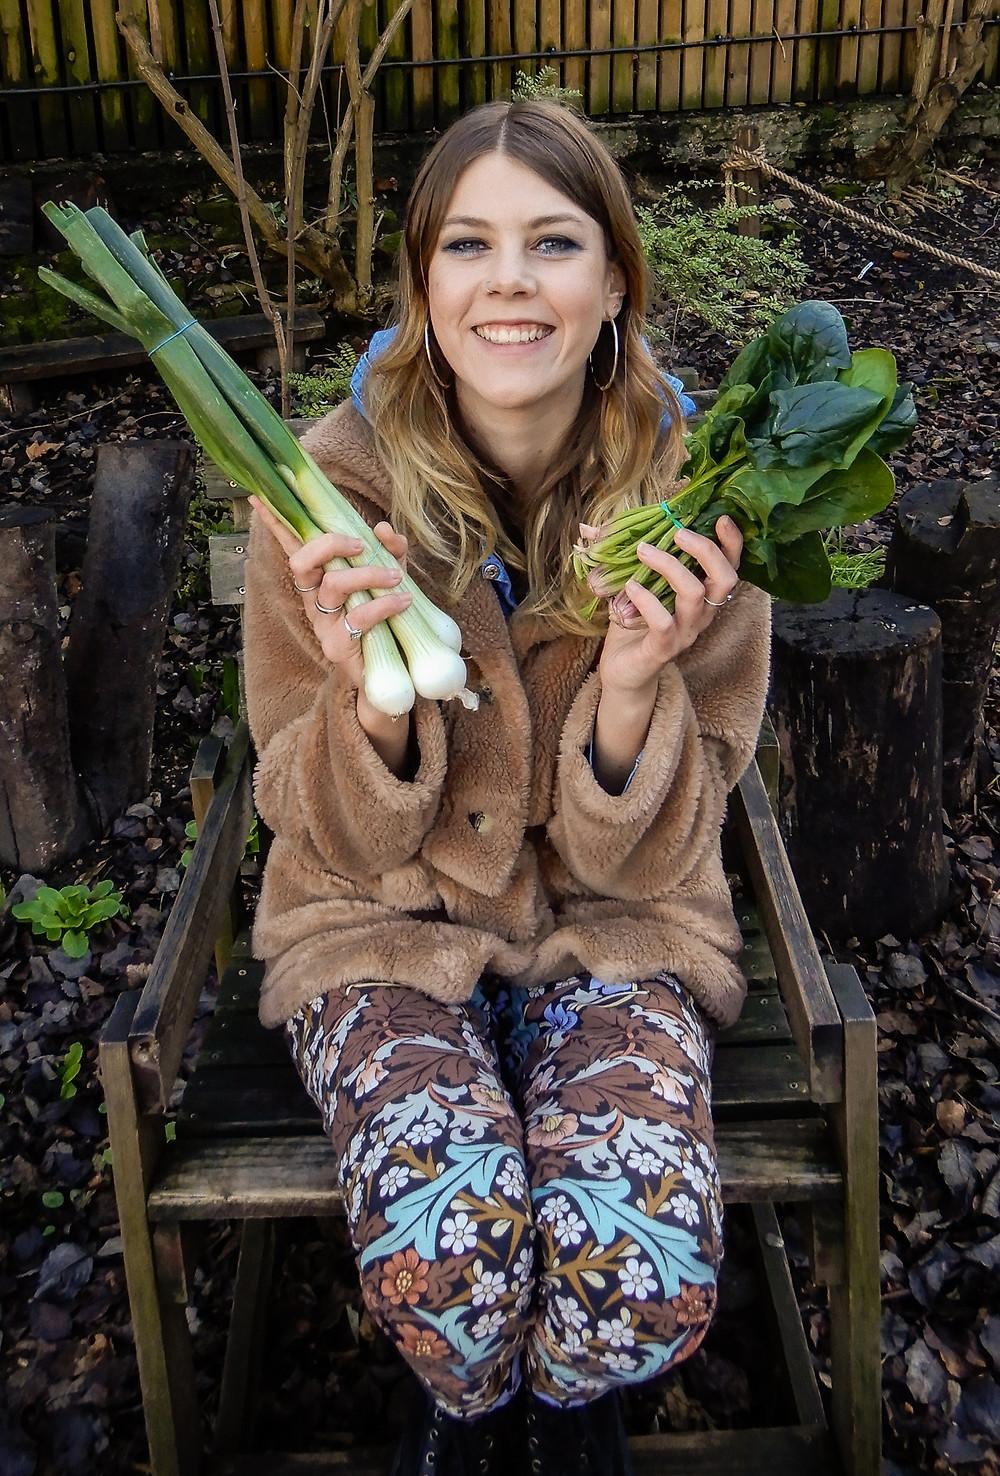 Showing off my cheap greens | Vegan on a Budget 101 | Vegan guide to eating on a budget/cheaply | The Doepy Vegan